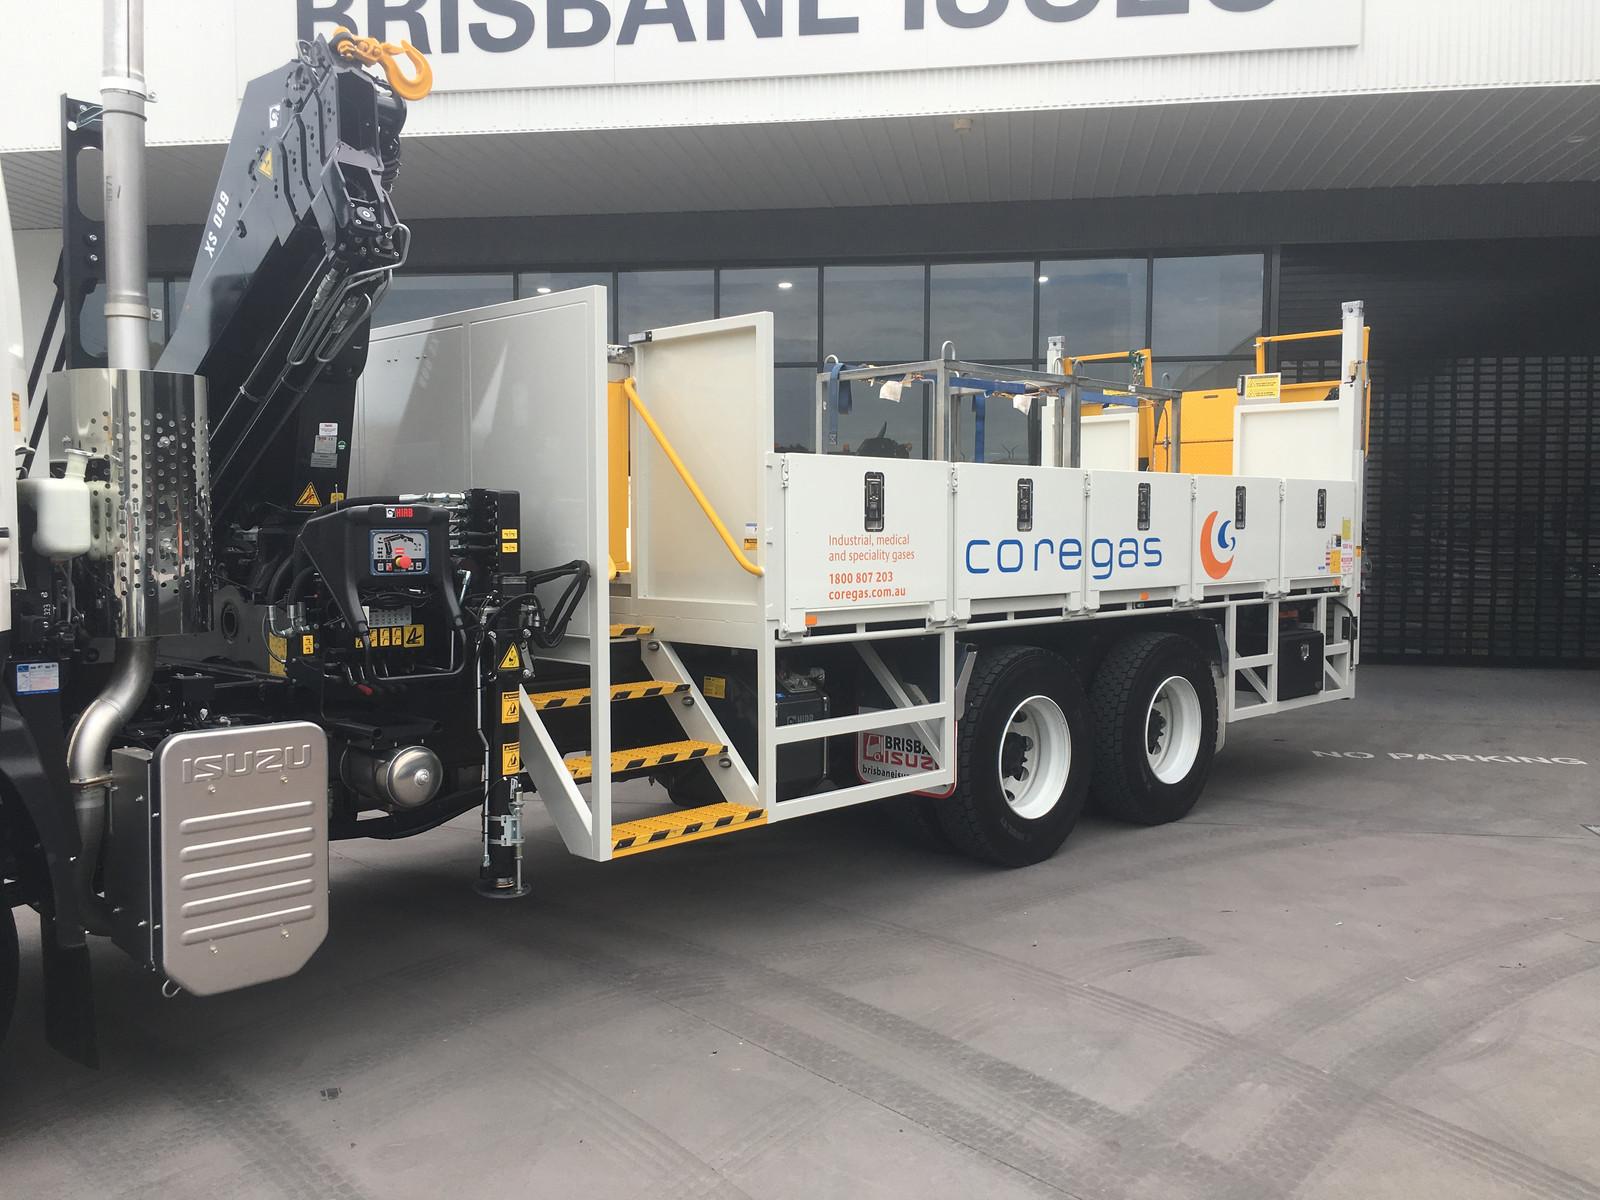 load restraint guide south australia